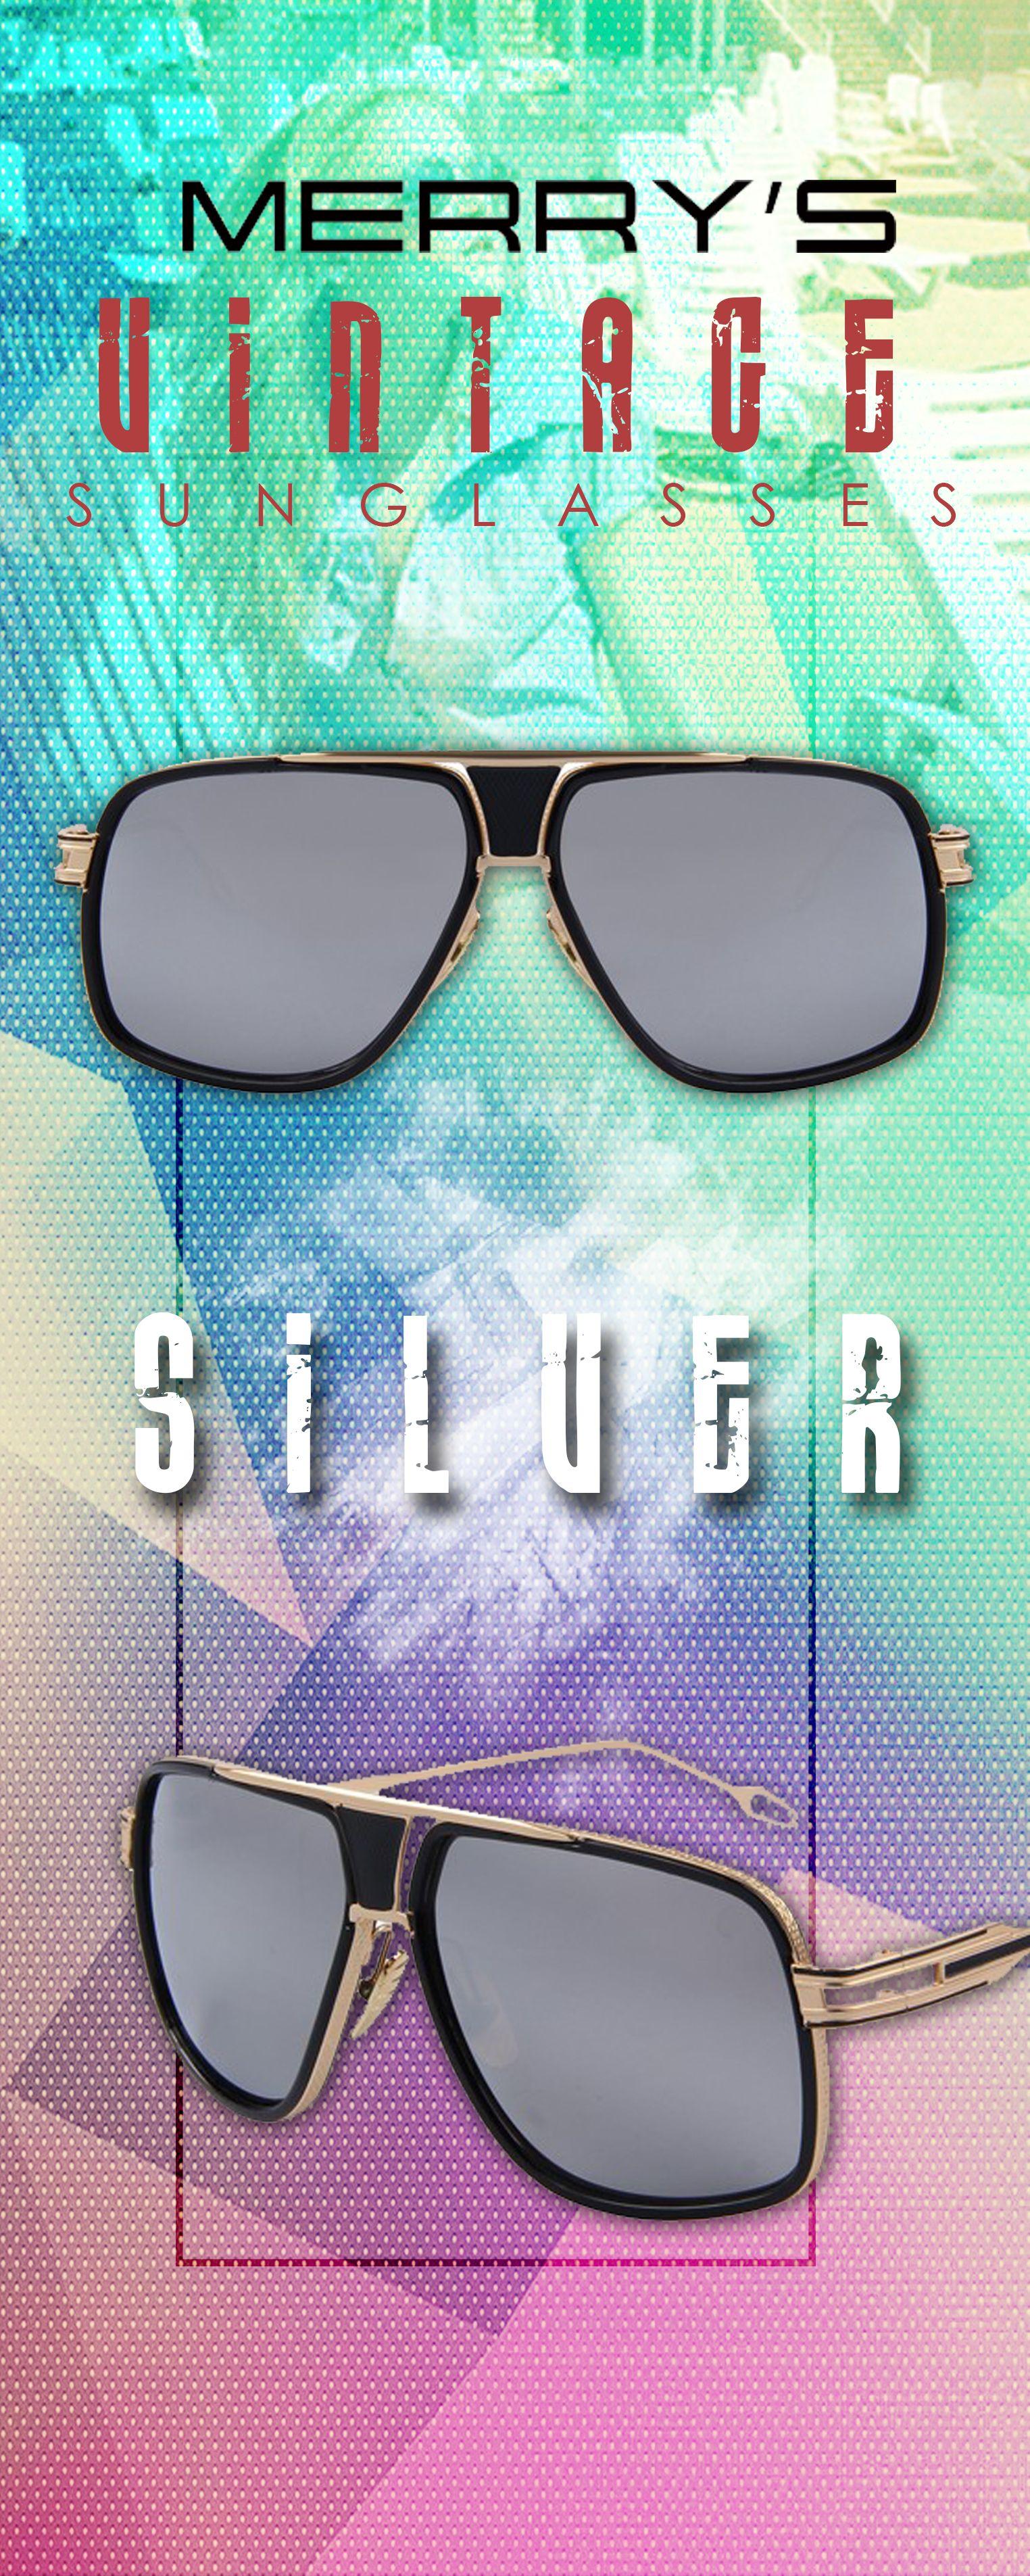 5eb33ba5be Men s UV400 Vintage Big Frame Summer Sun Glasses - Silver merry s Men s affordable  top brand designer